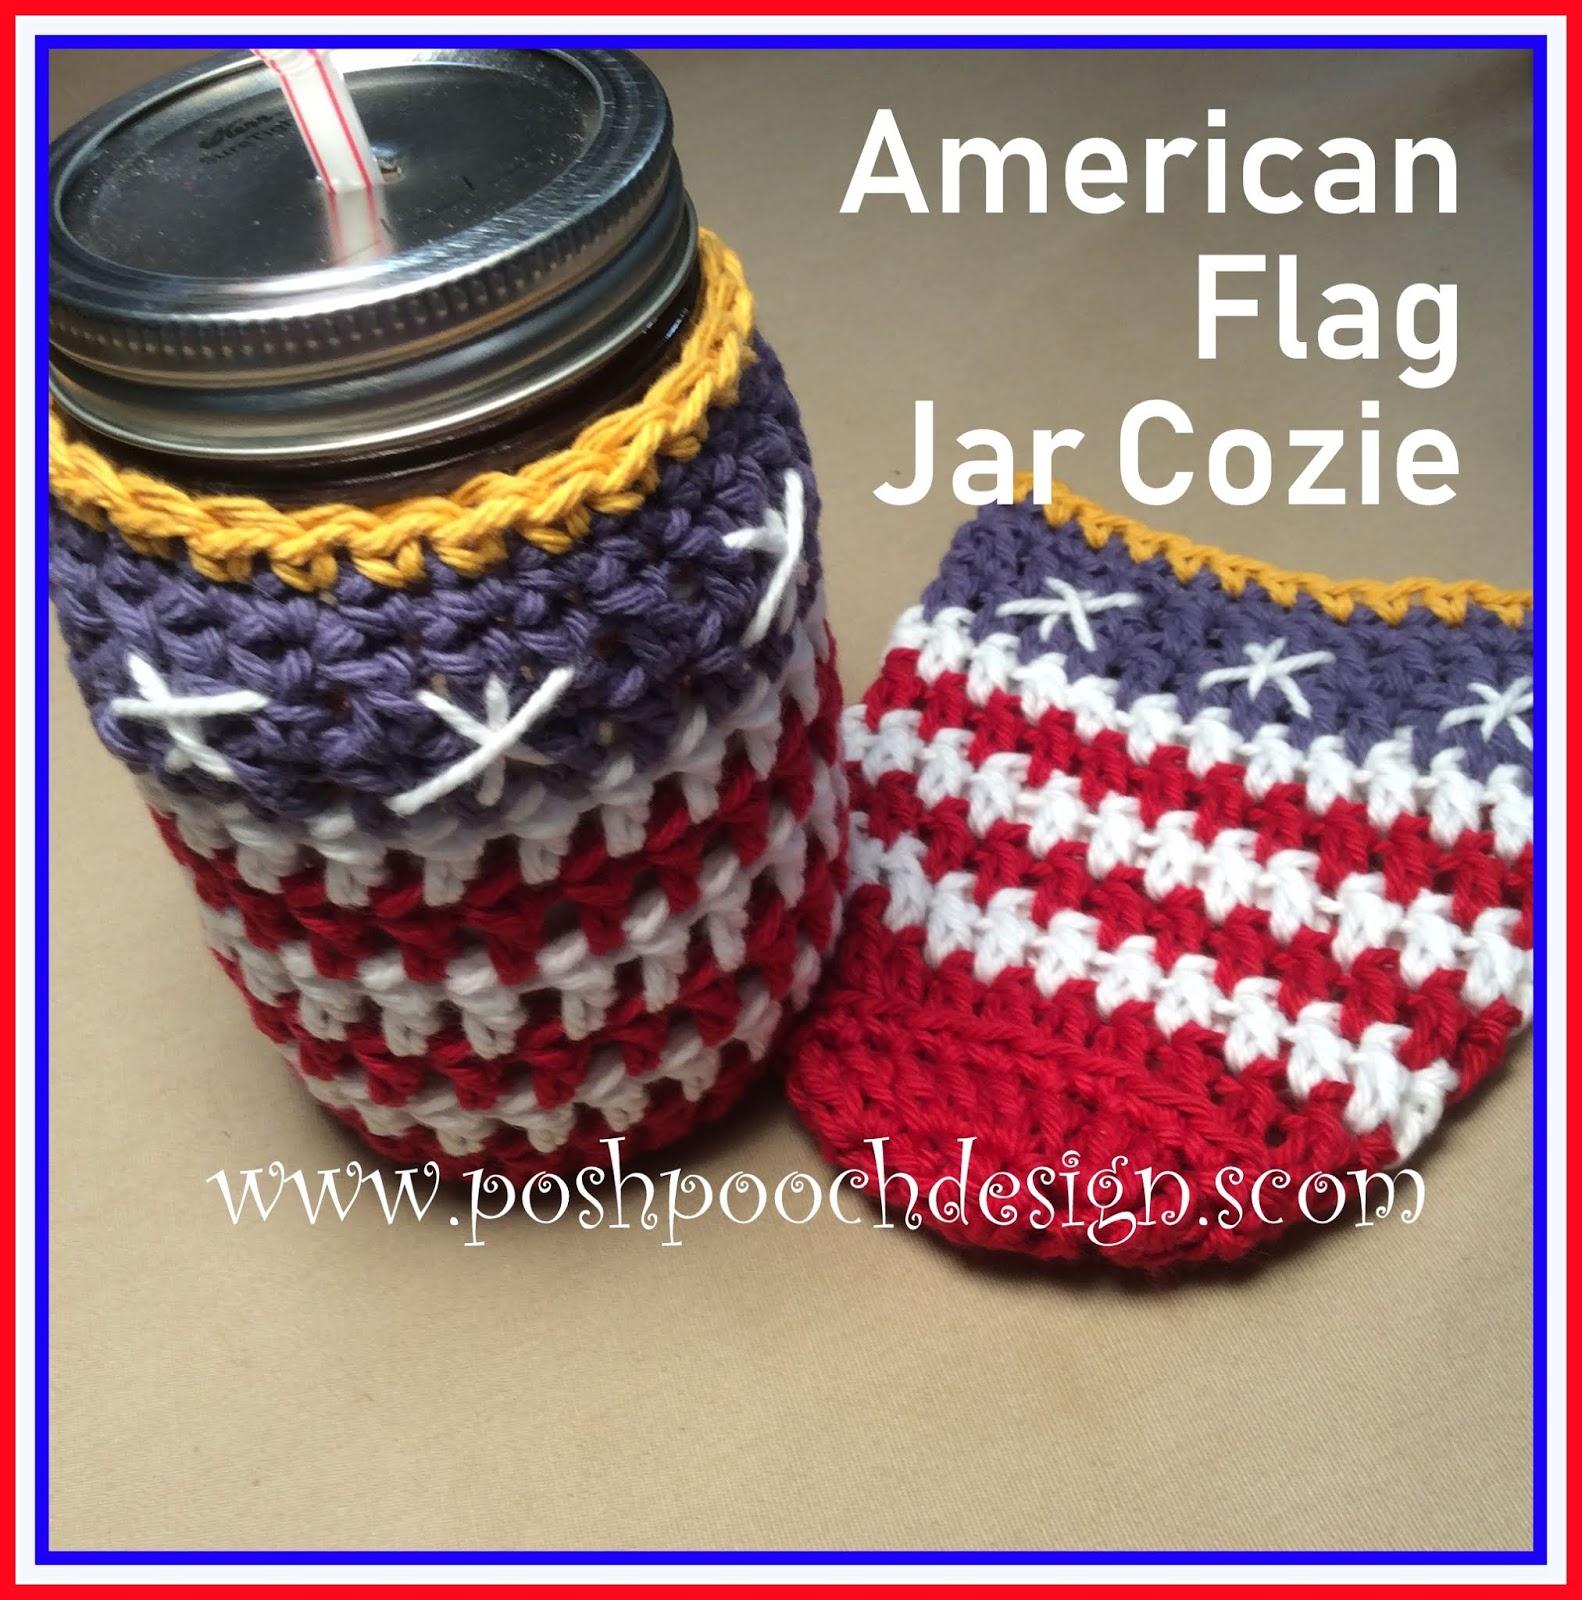 Posh Pooch Designs Dog Clothes American Flag Jar Cozie Crochet